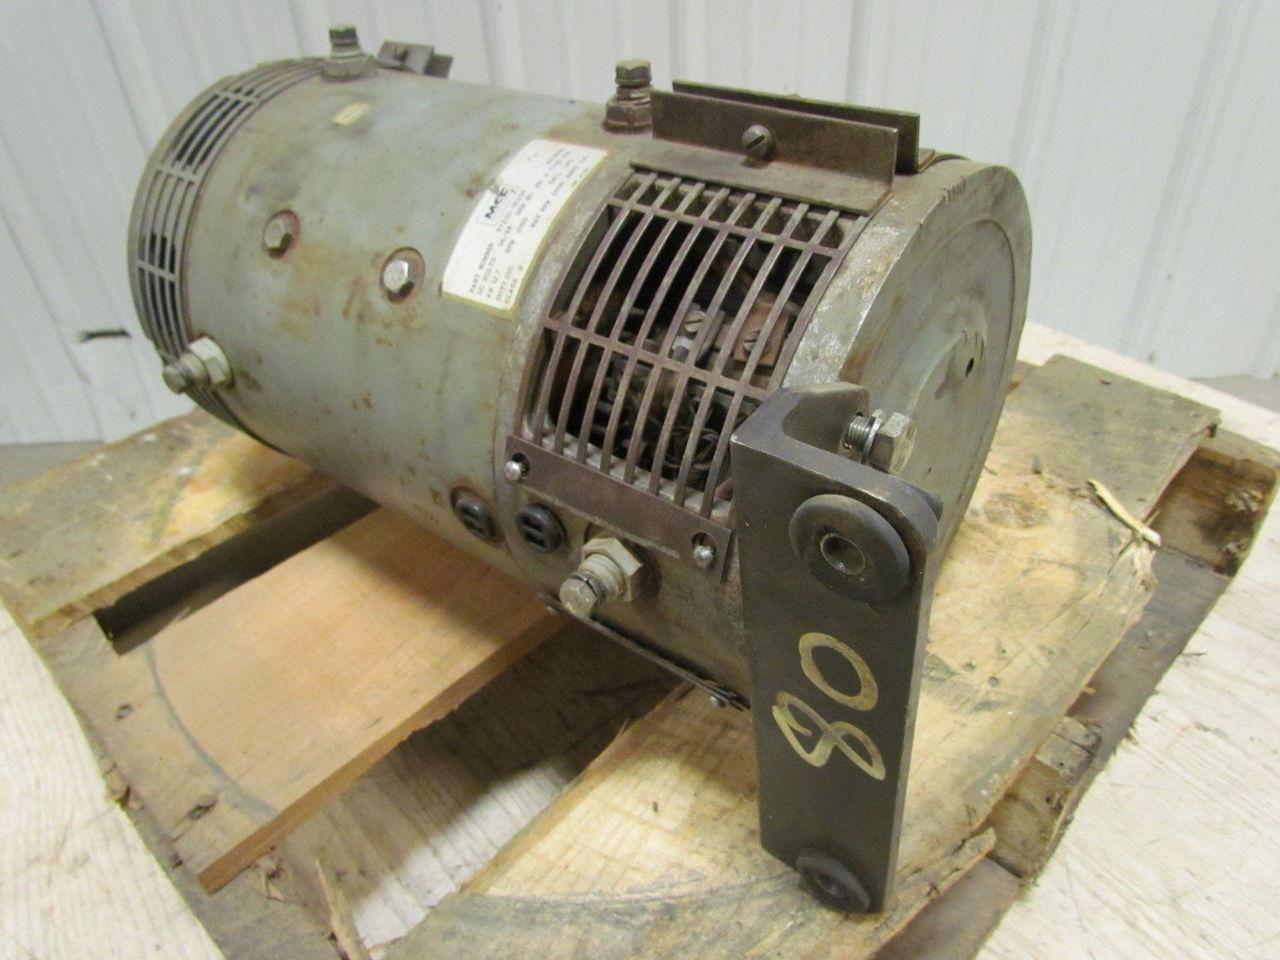 Mcf dc electric forklift hydraulic pump motor 36 48 volt for Electric motor hydraulic pump